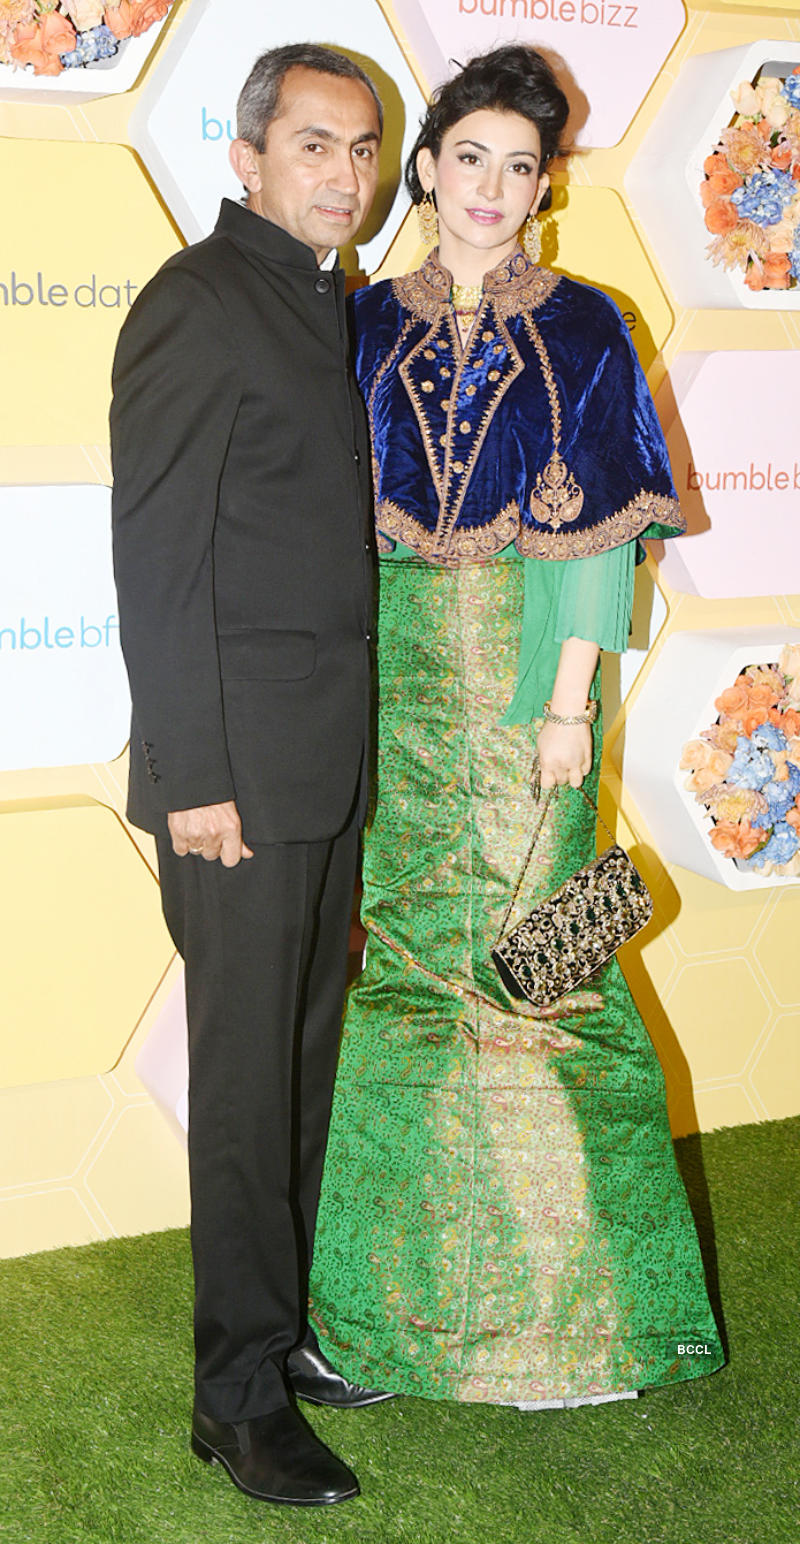 Newlyweds Priyanka Chopra and Nick Jonas grace an app launch party